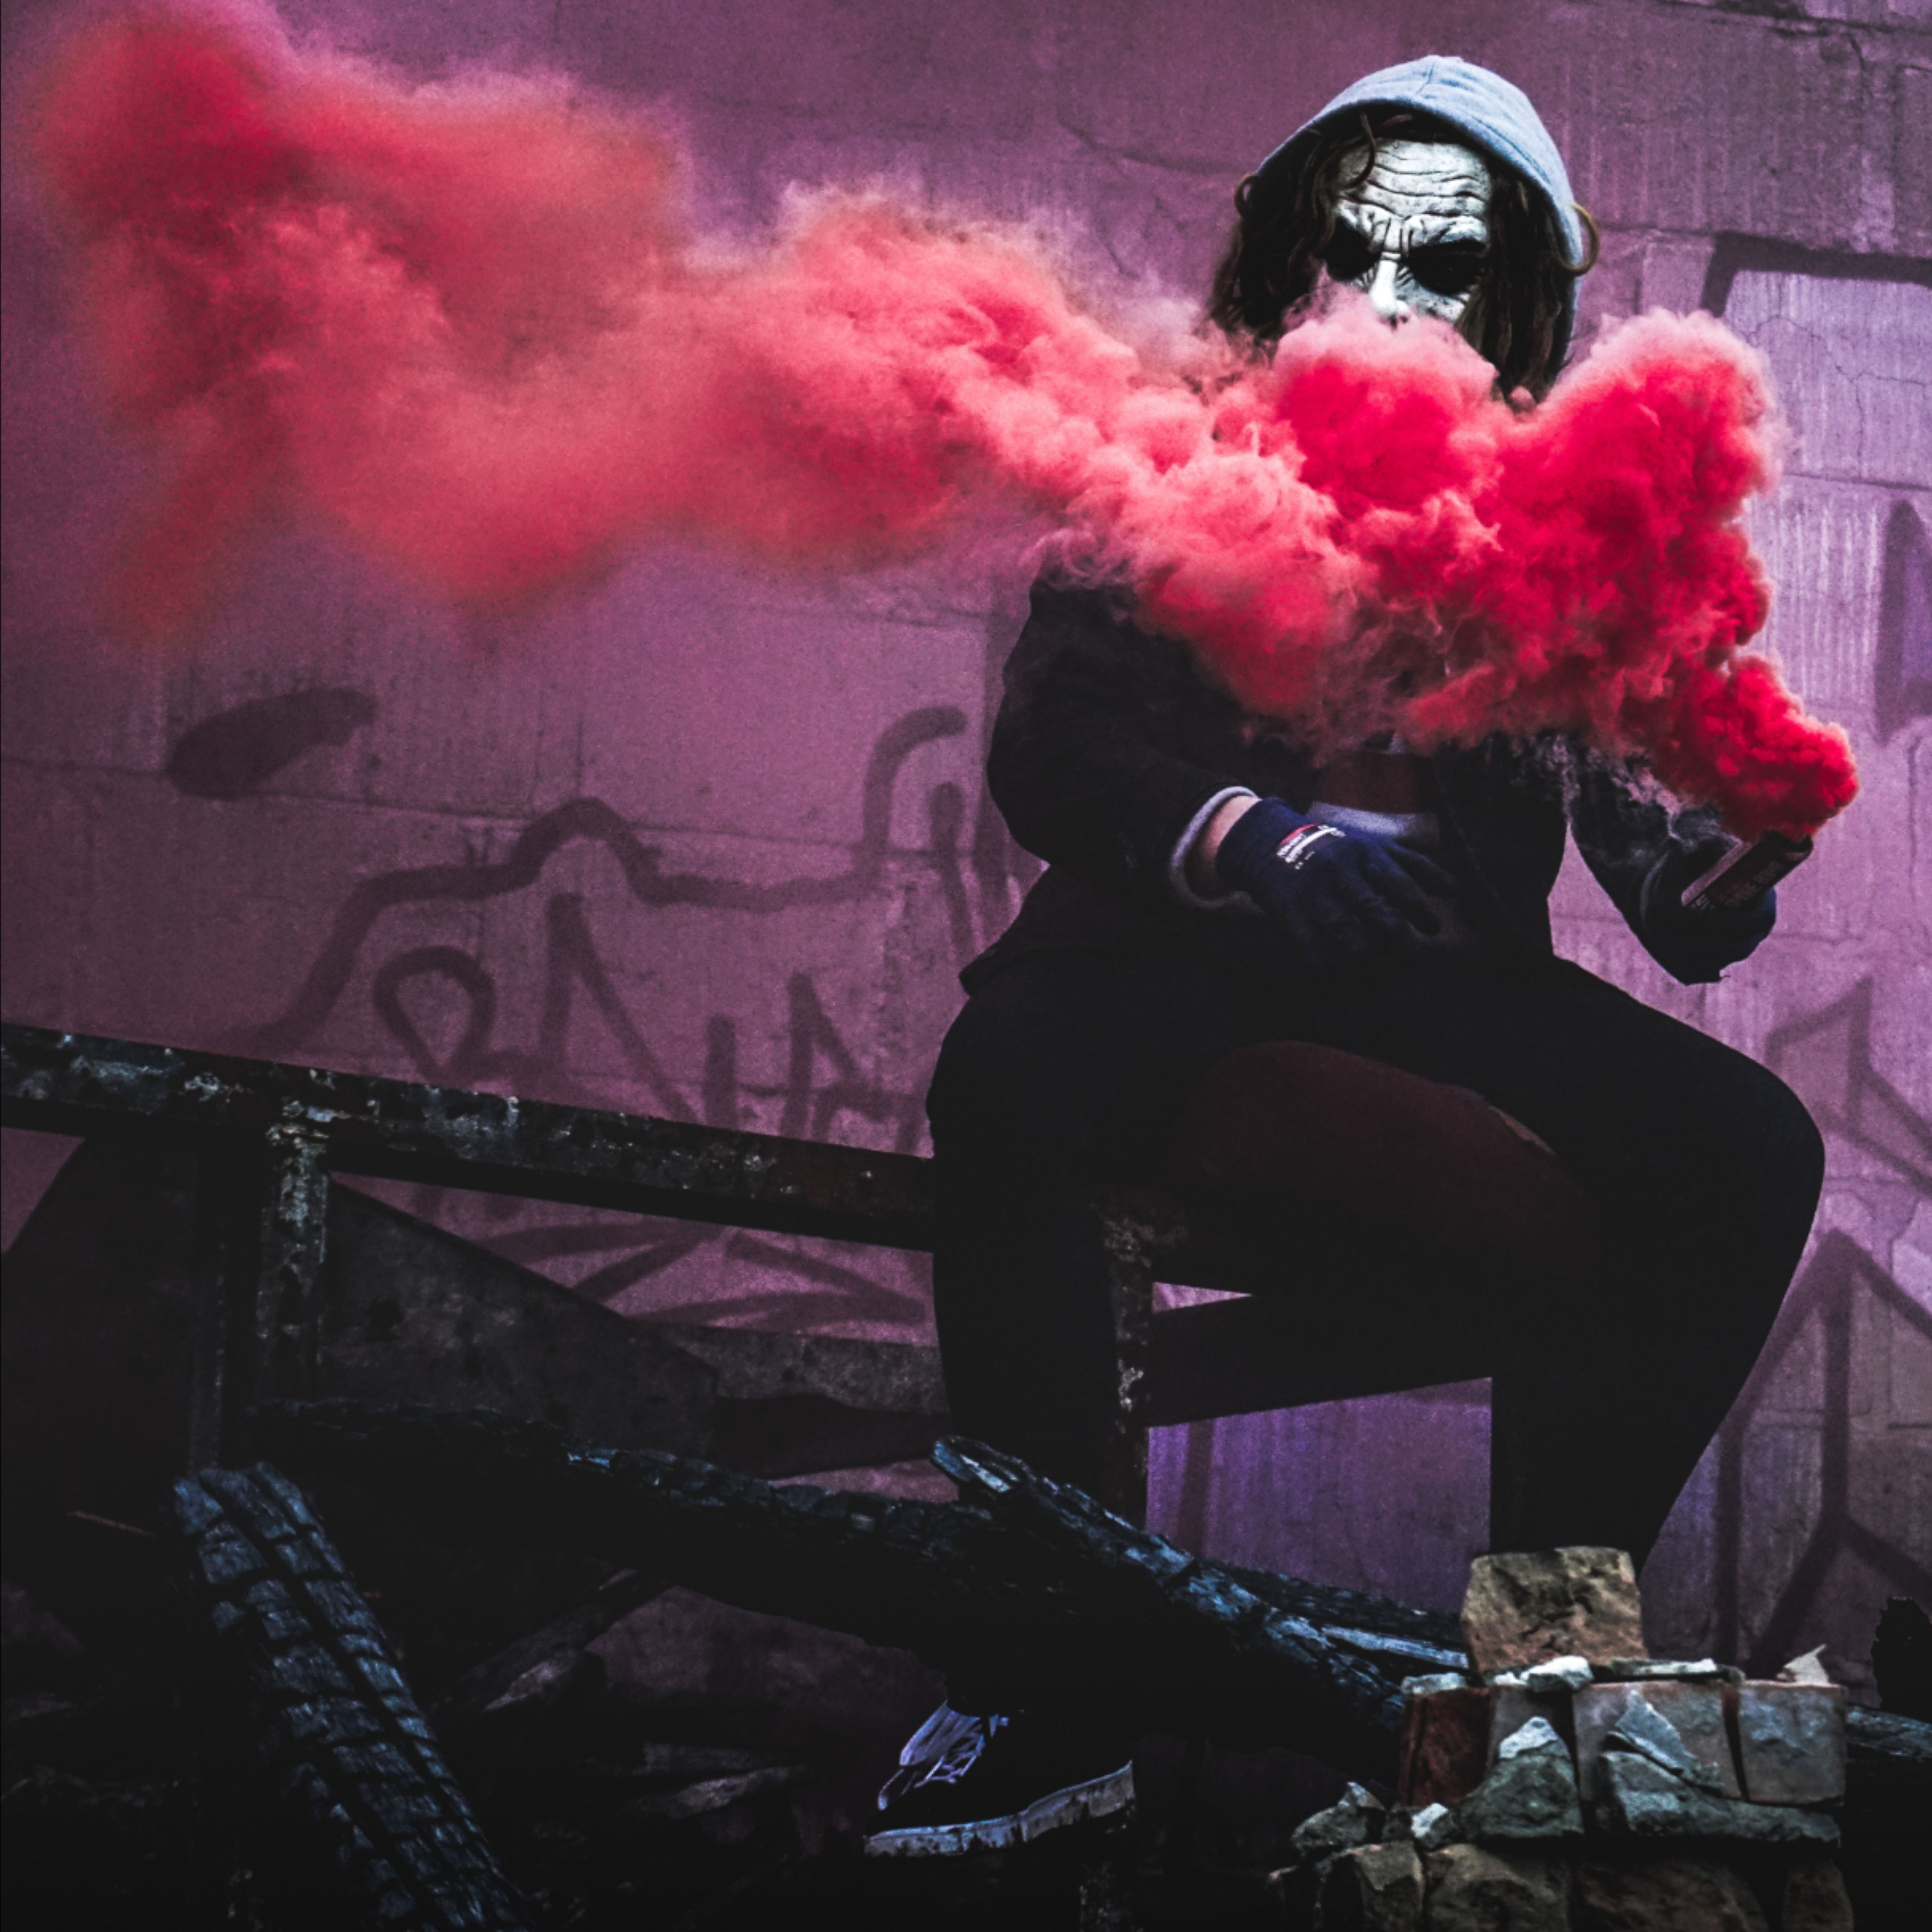 Pin On Smoke Bomb Photography